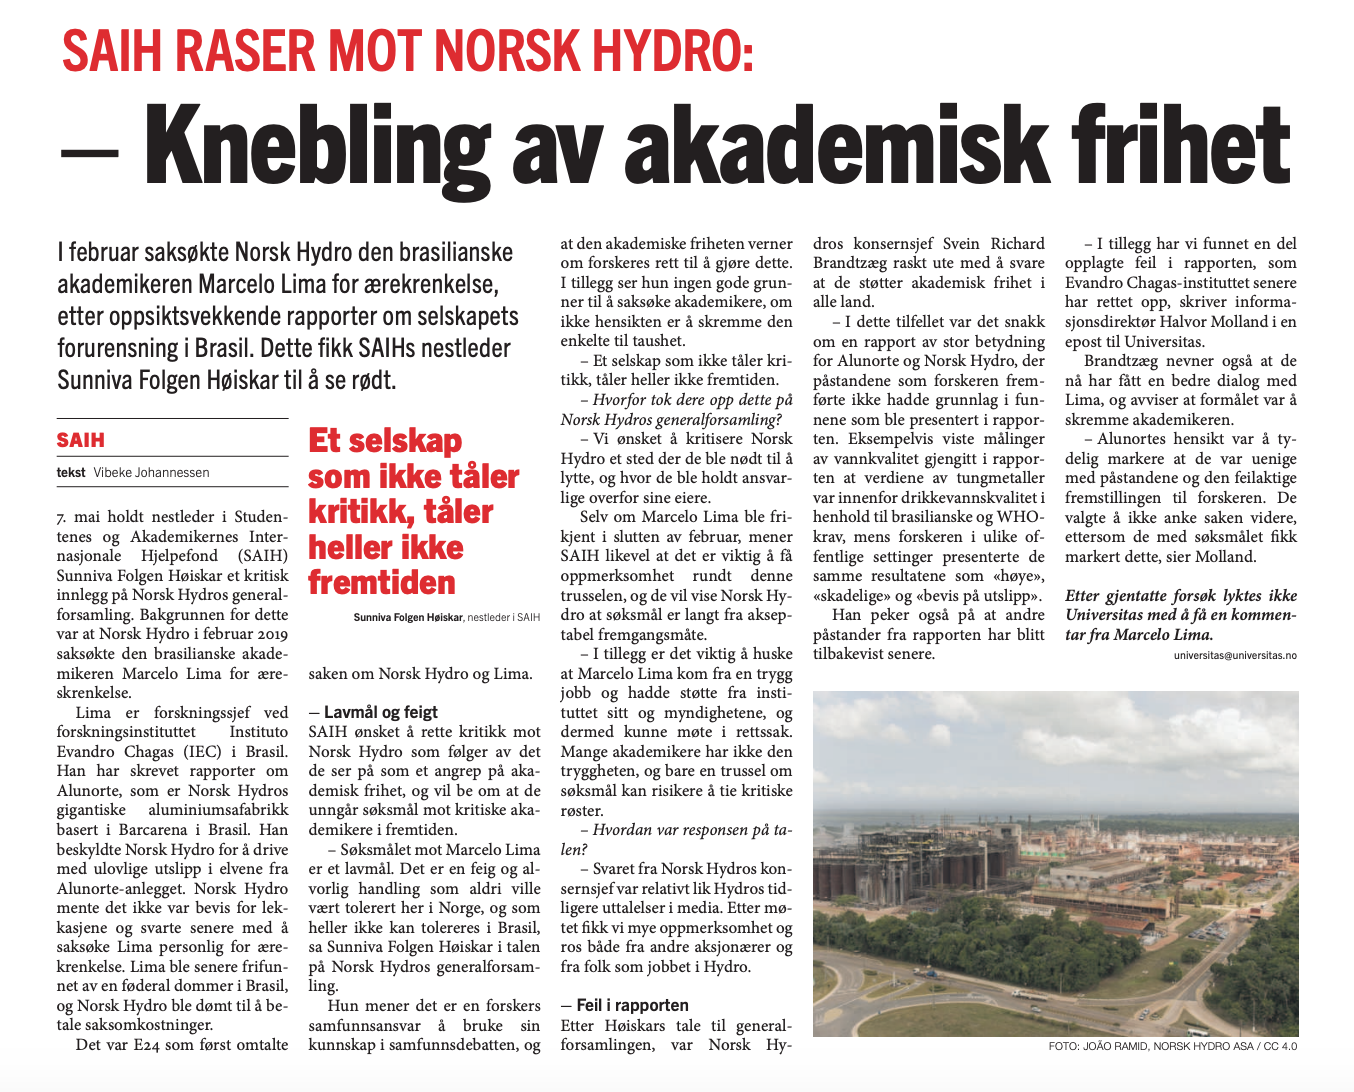 SaIH mot norsk hydro -